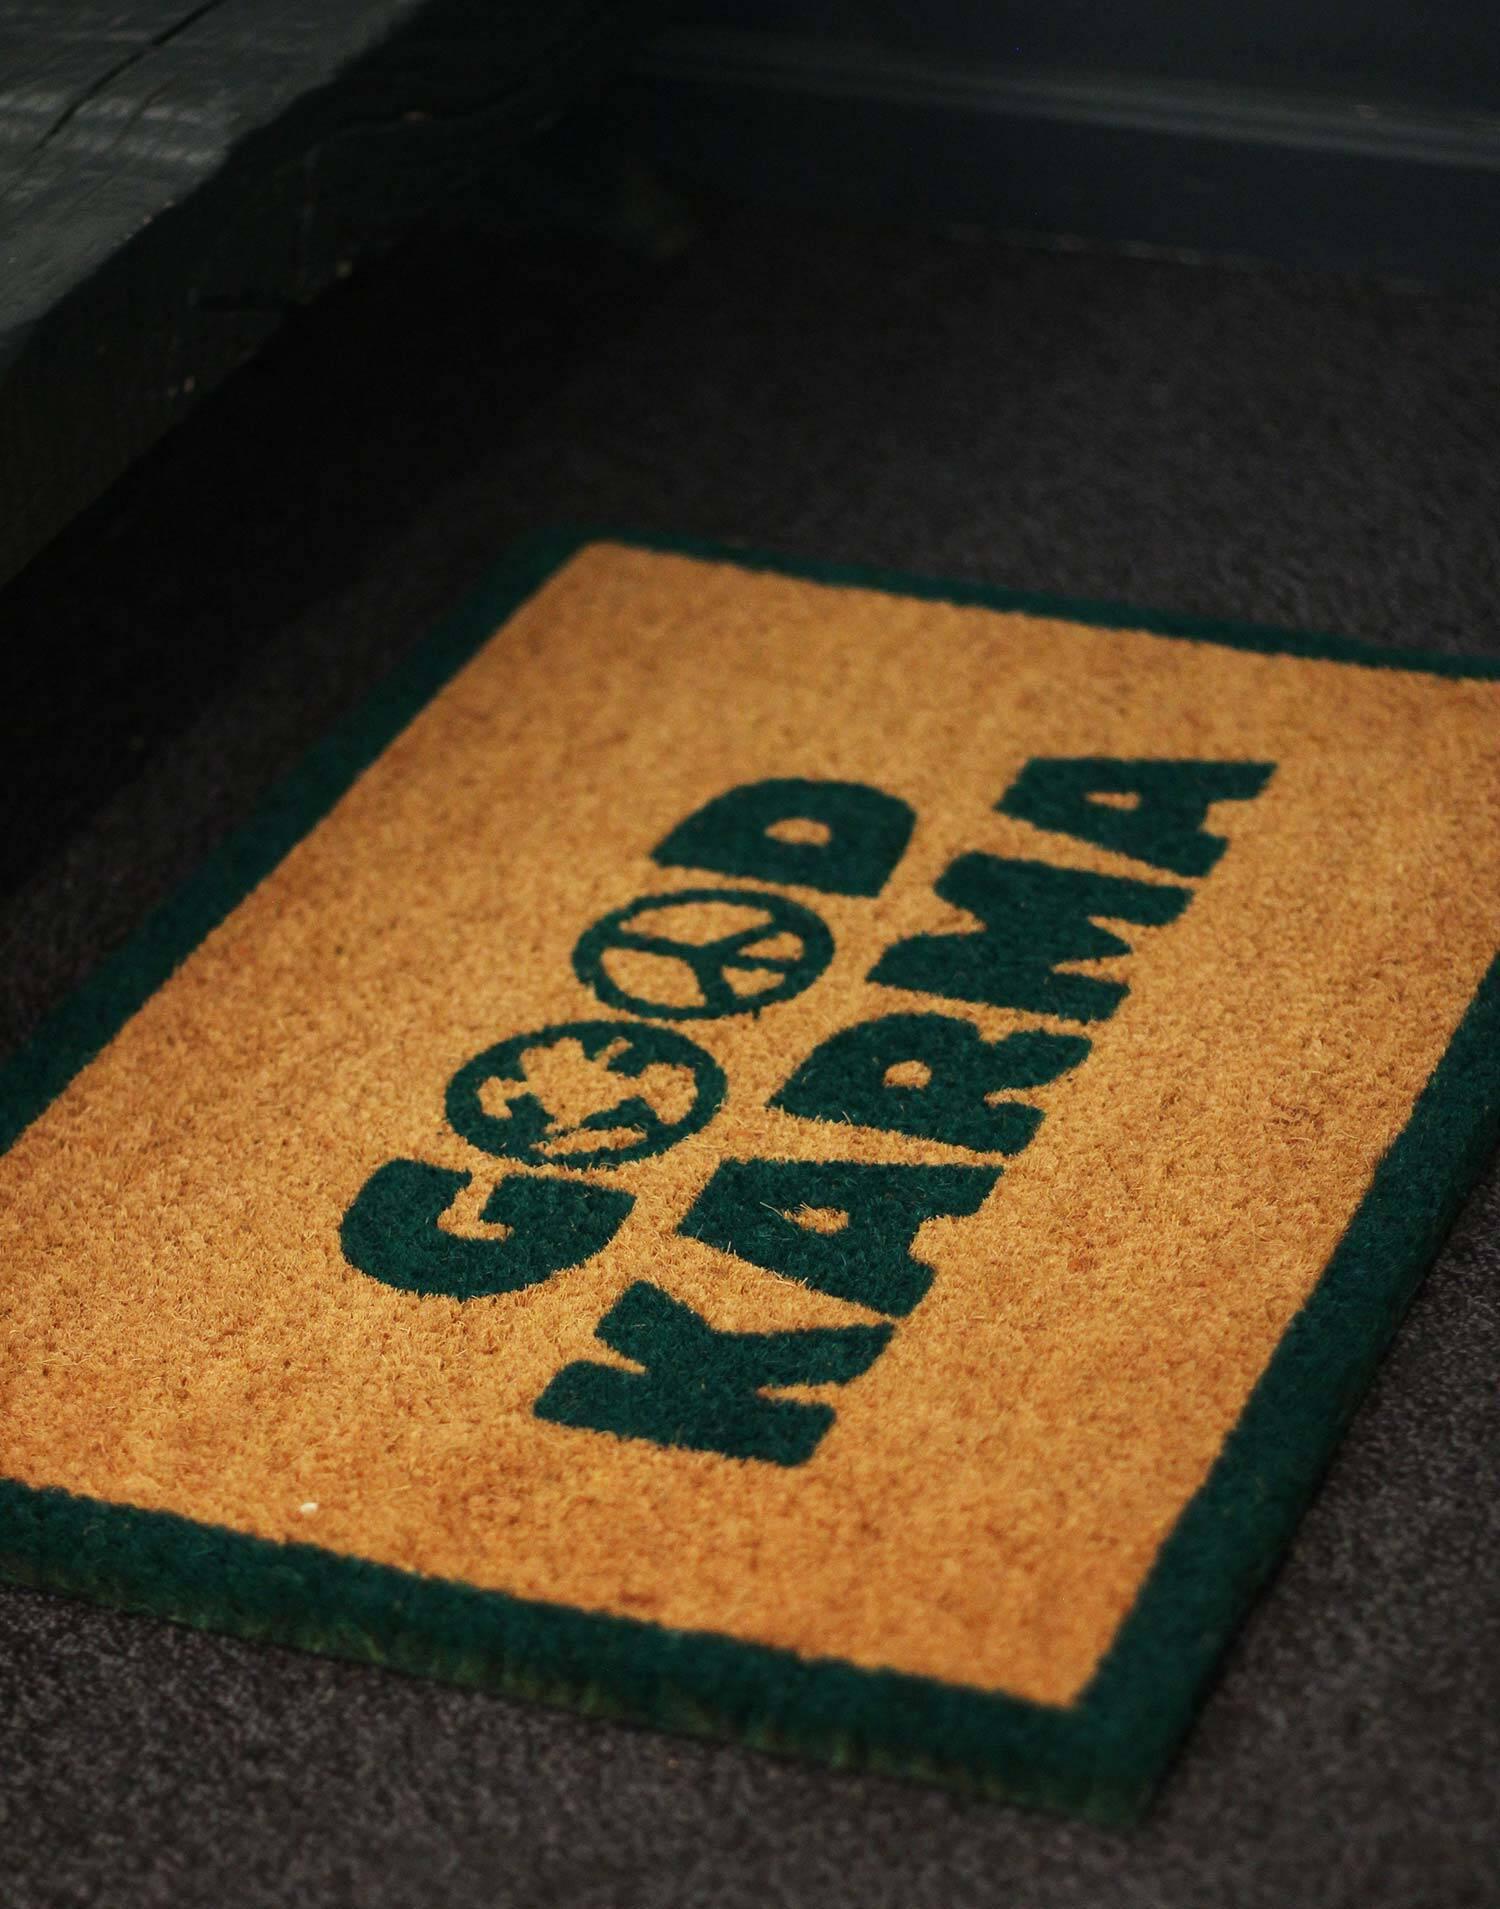 Felpudo good karma